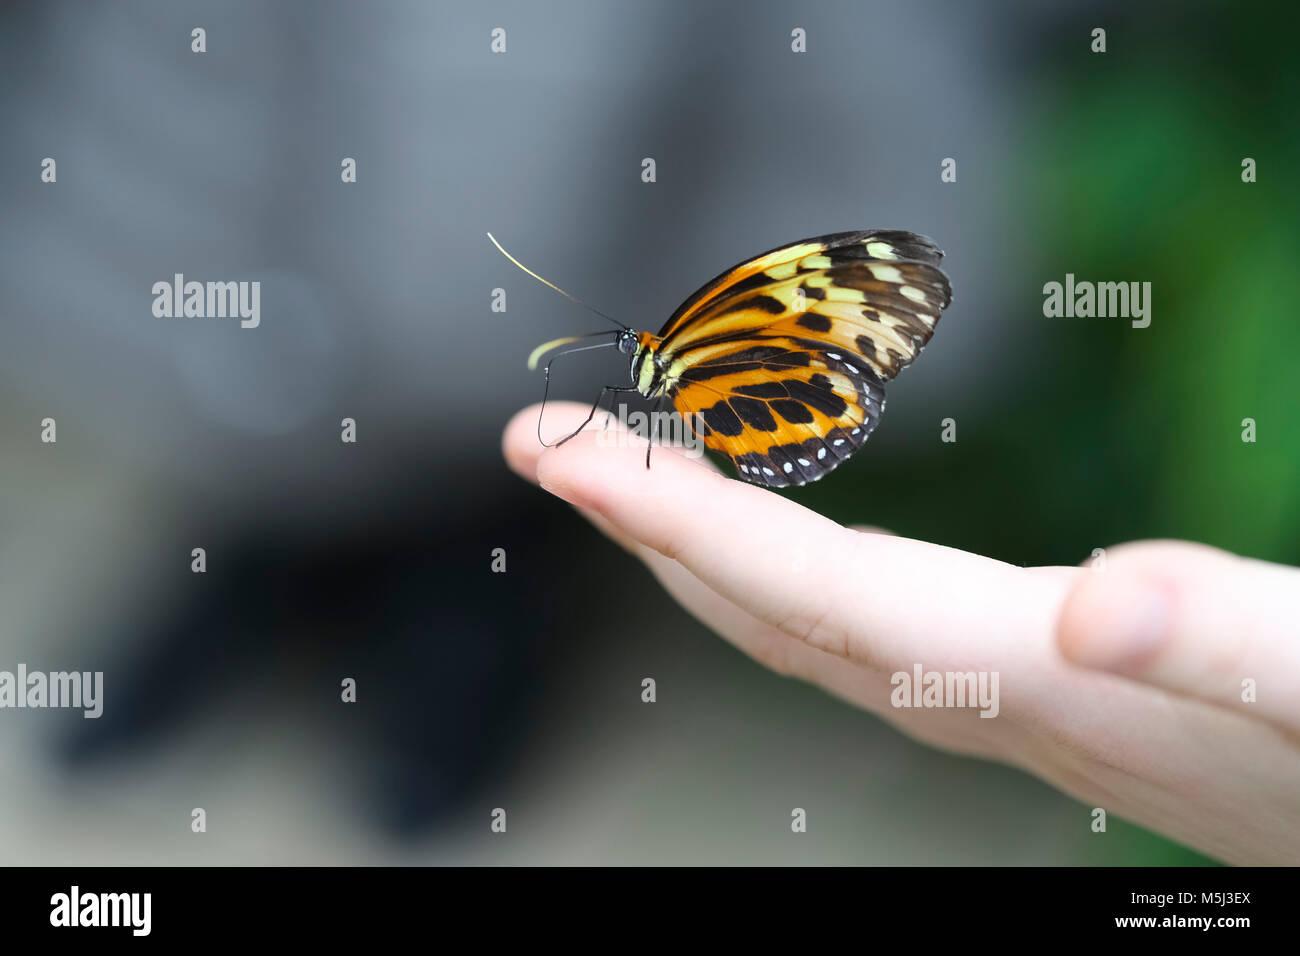 Monarch butterfly, Danaus plexippus, sitting on hand - Stock Image